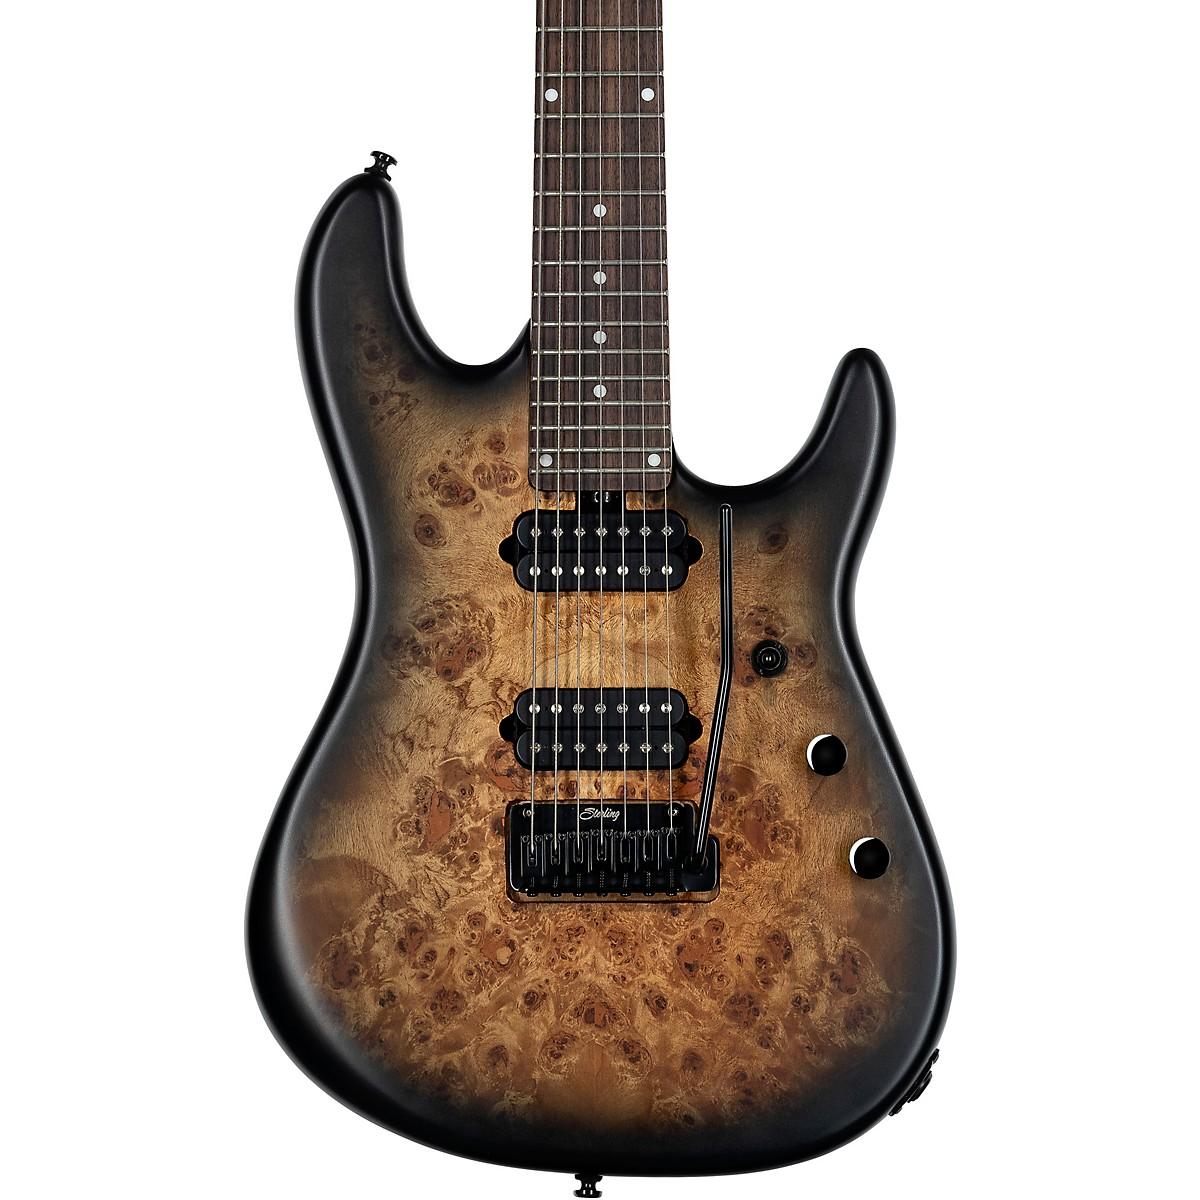 Sterling by Music Man Jason Richardson Cutlass Signature 7-String Electric Guitar